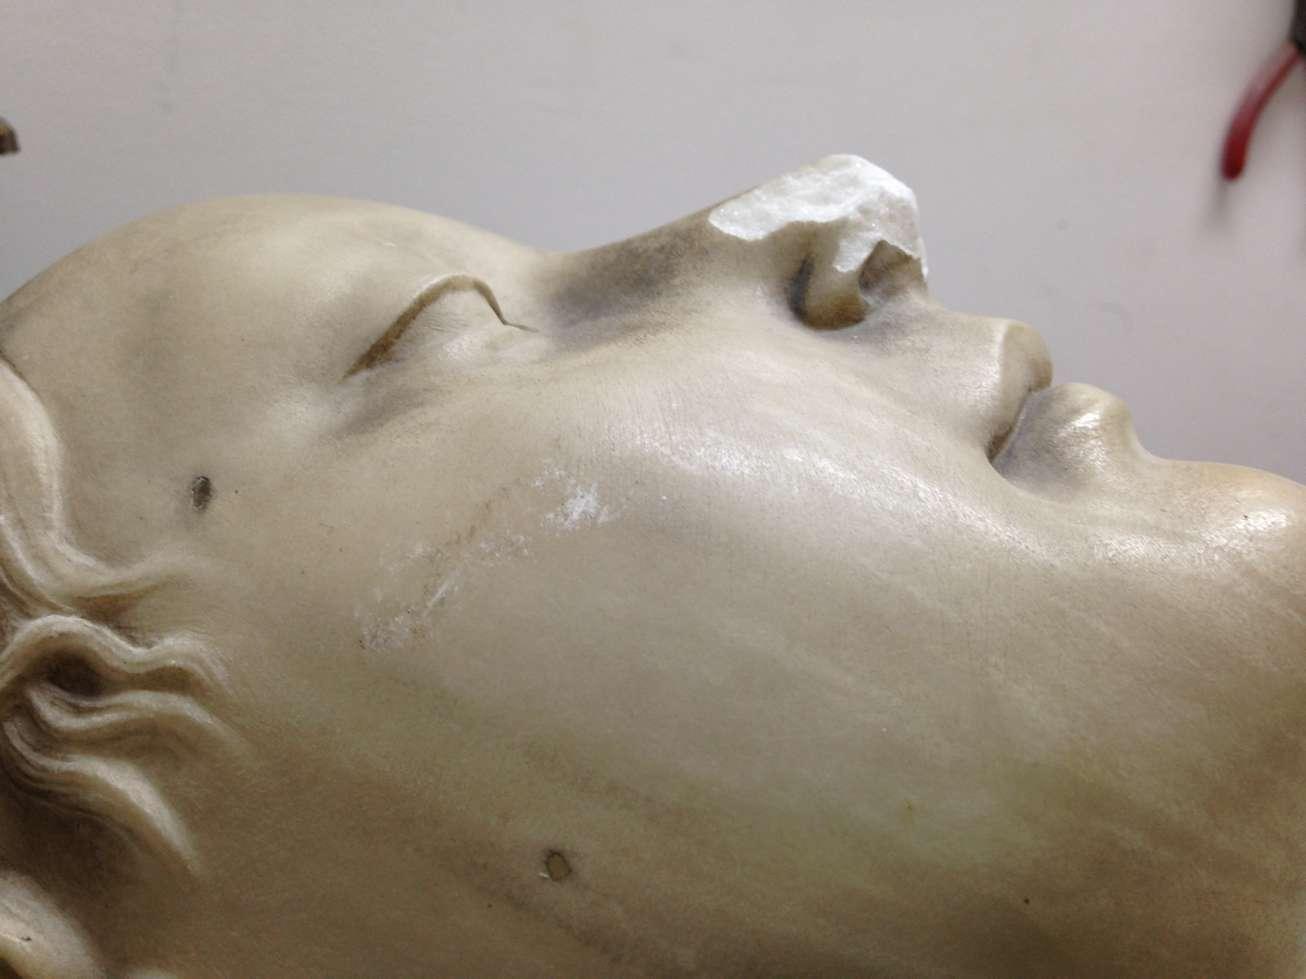 marbre-italie-francesco-laurana-portrait-femme-1472-art-restauration-reparation-restaurarte.jpg